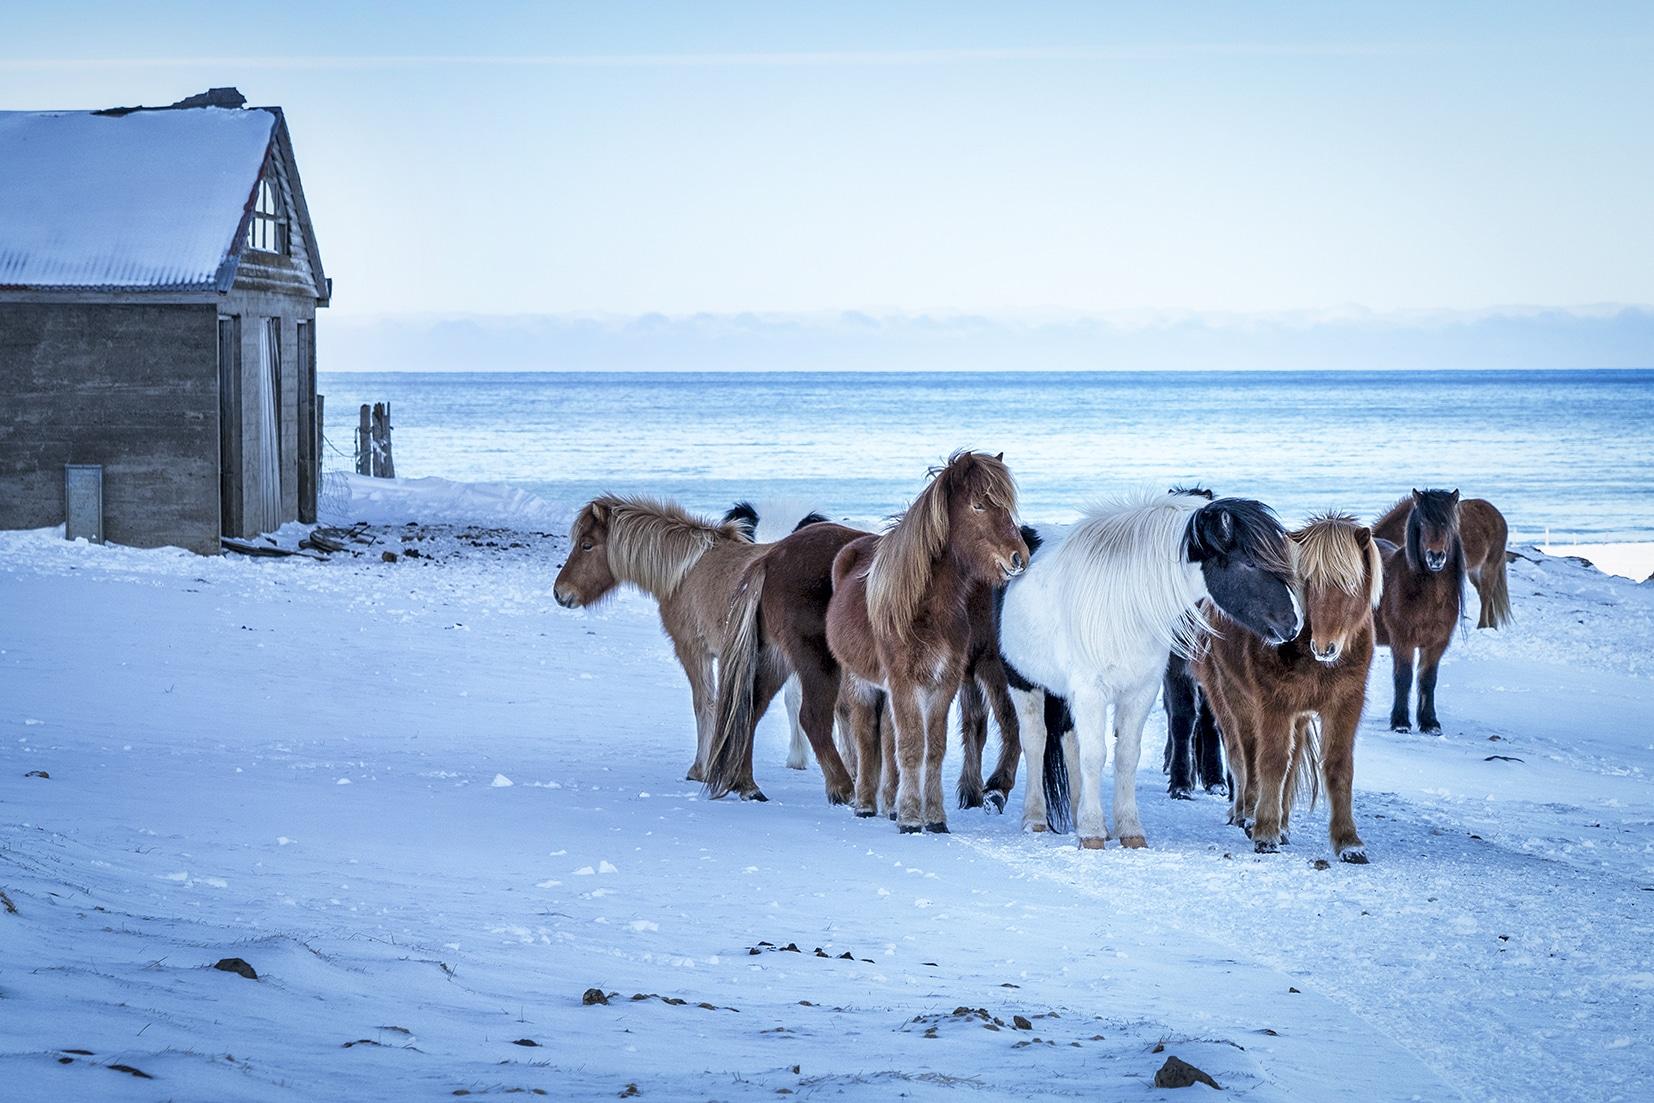 Tindastóll chevaux neige mer Islande du Nord